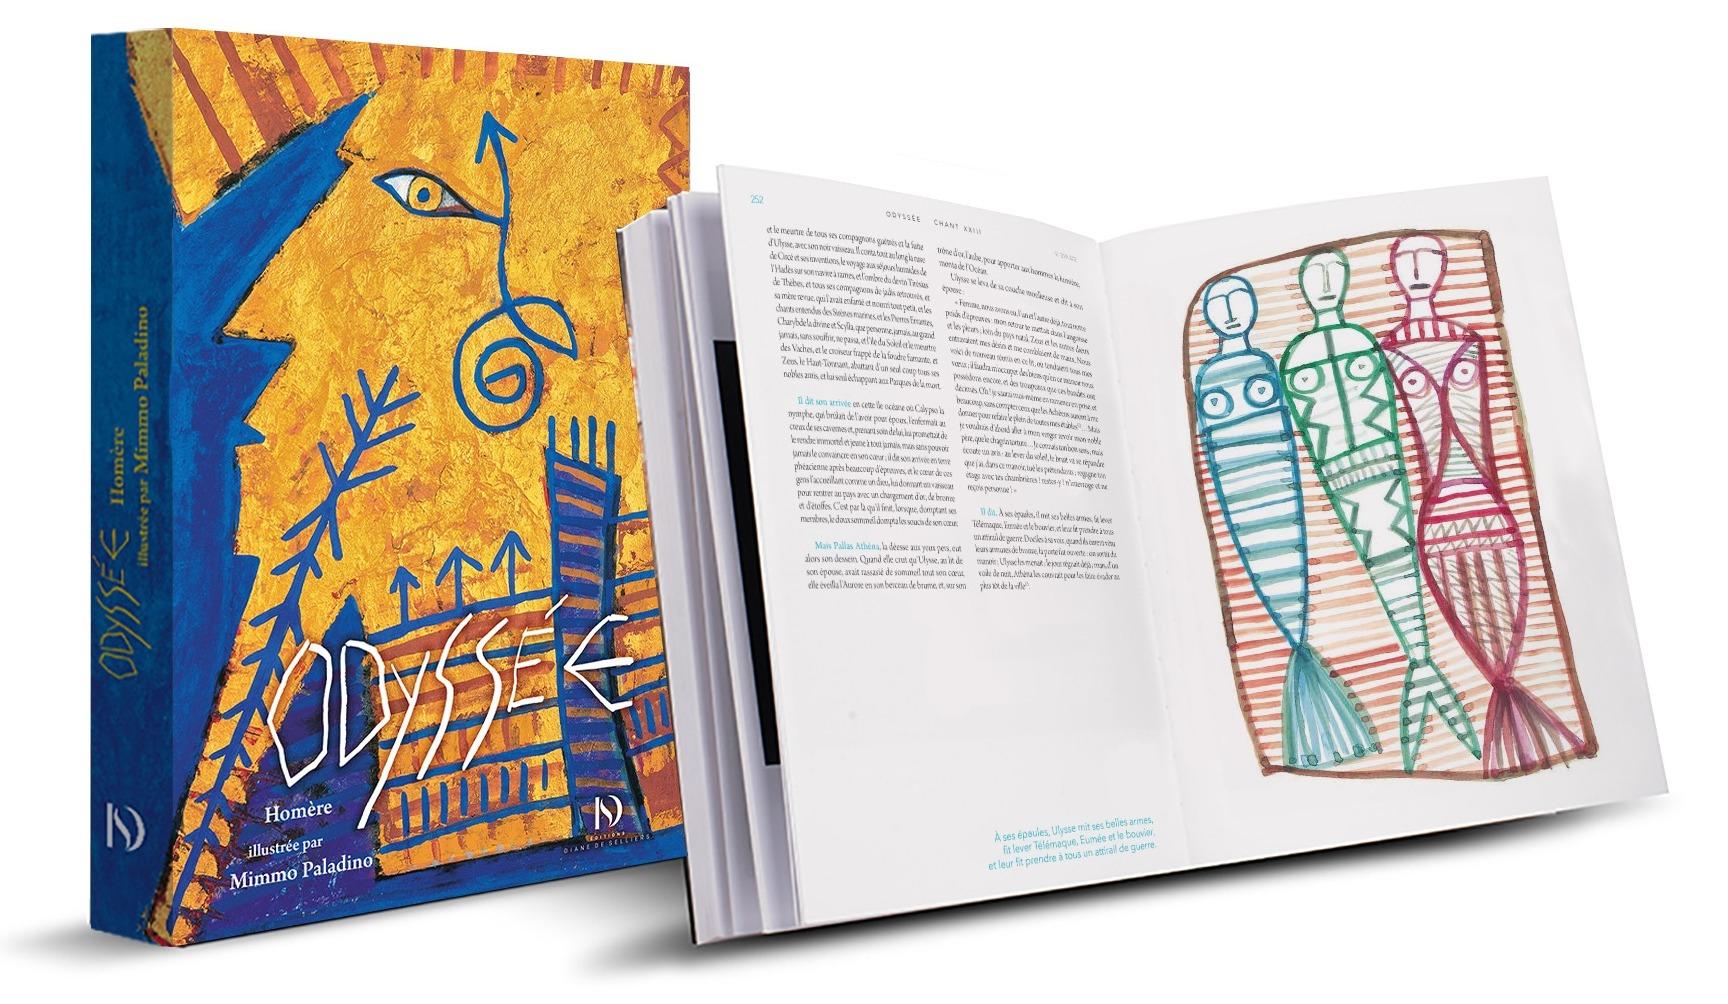 Liliade et l'Odyssee - Homere - La Petite Collection - Couverture